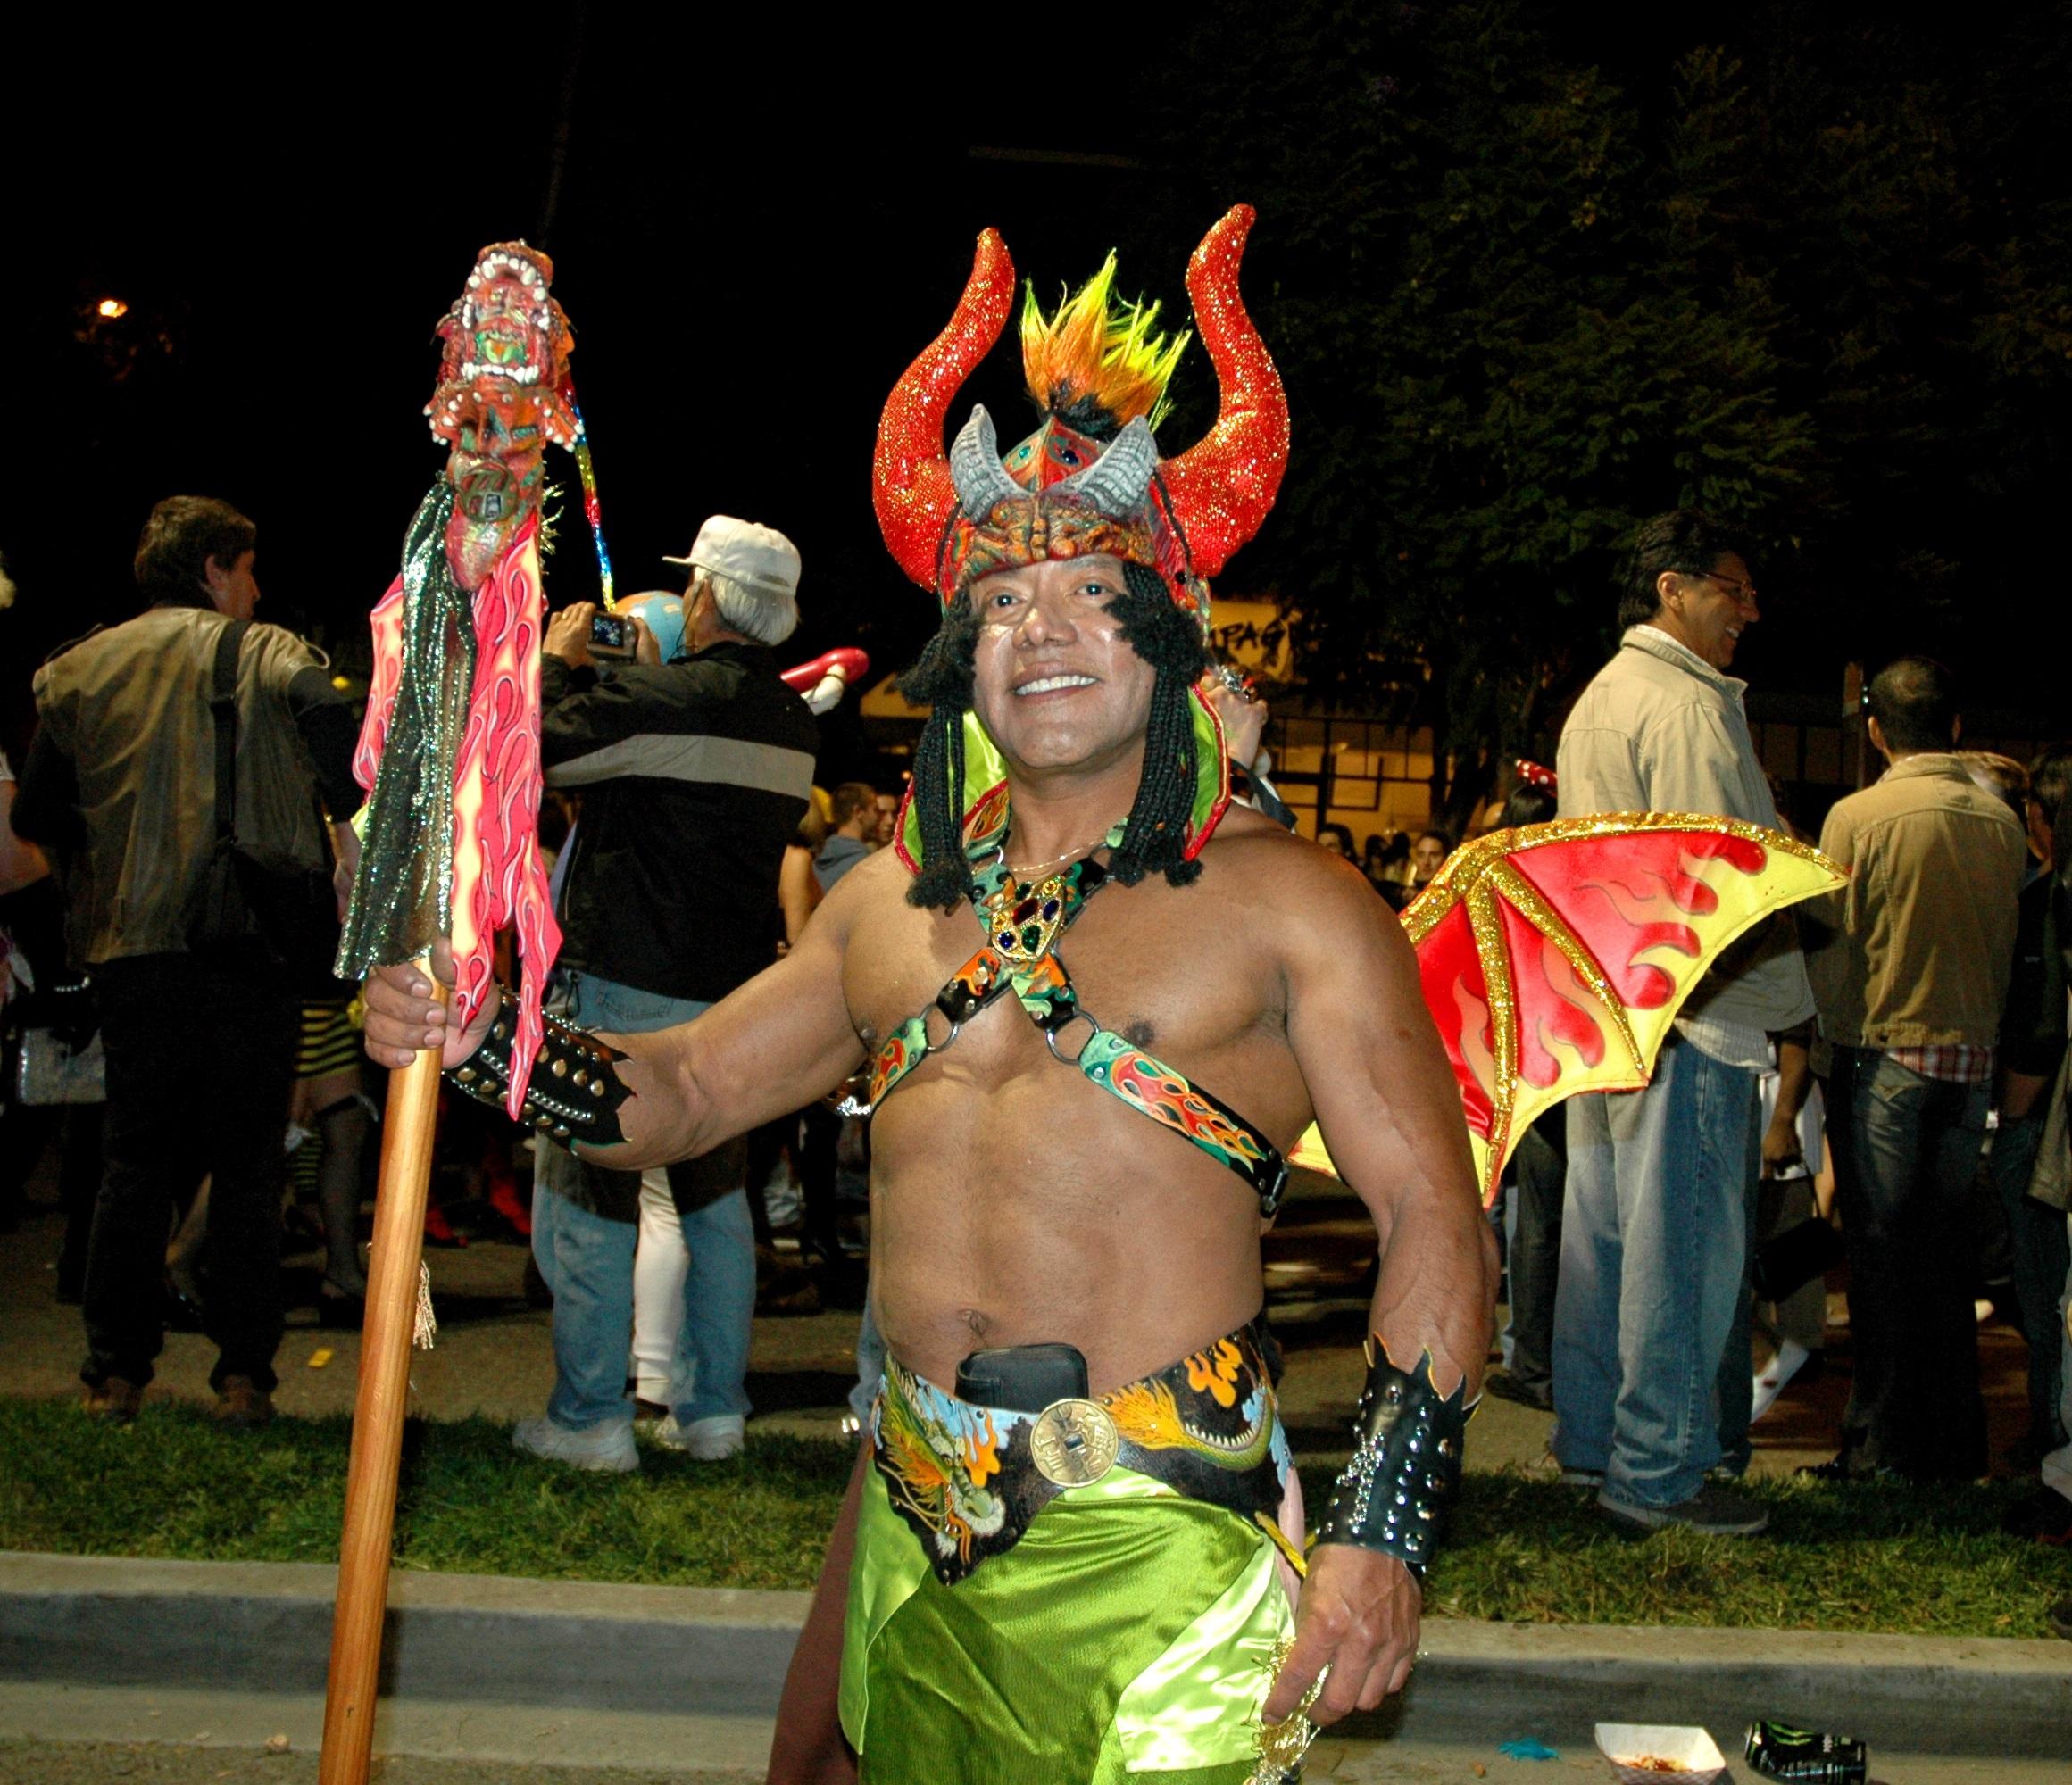 File:Aztec devil - 2007 West Hollywood Halloween Carnival.jpg ...